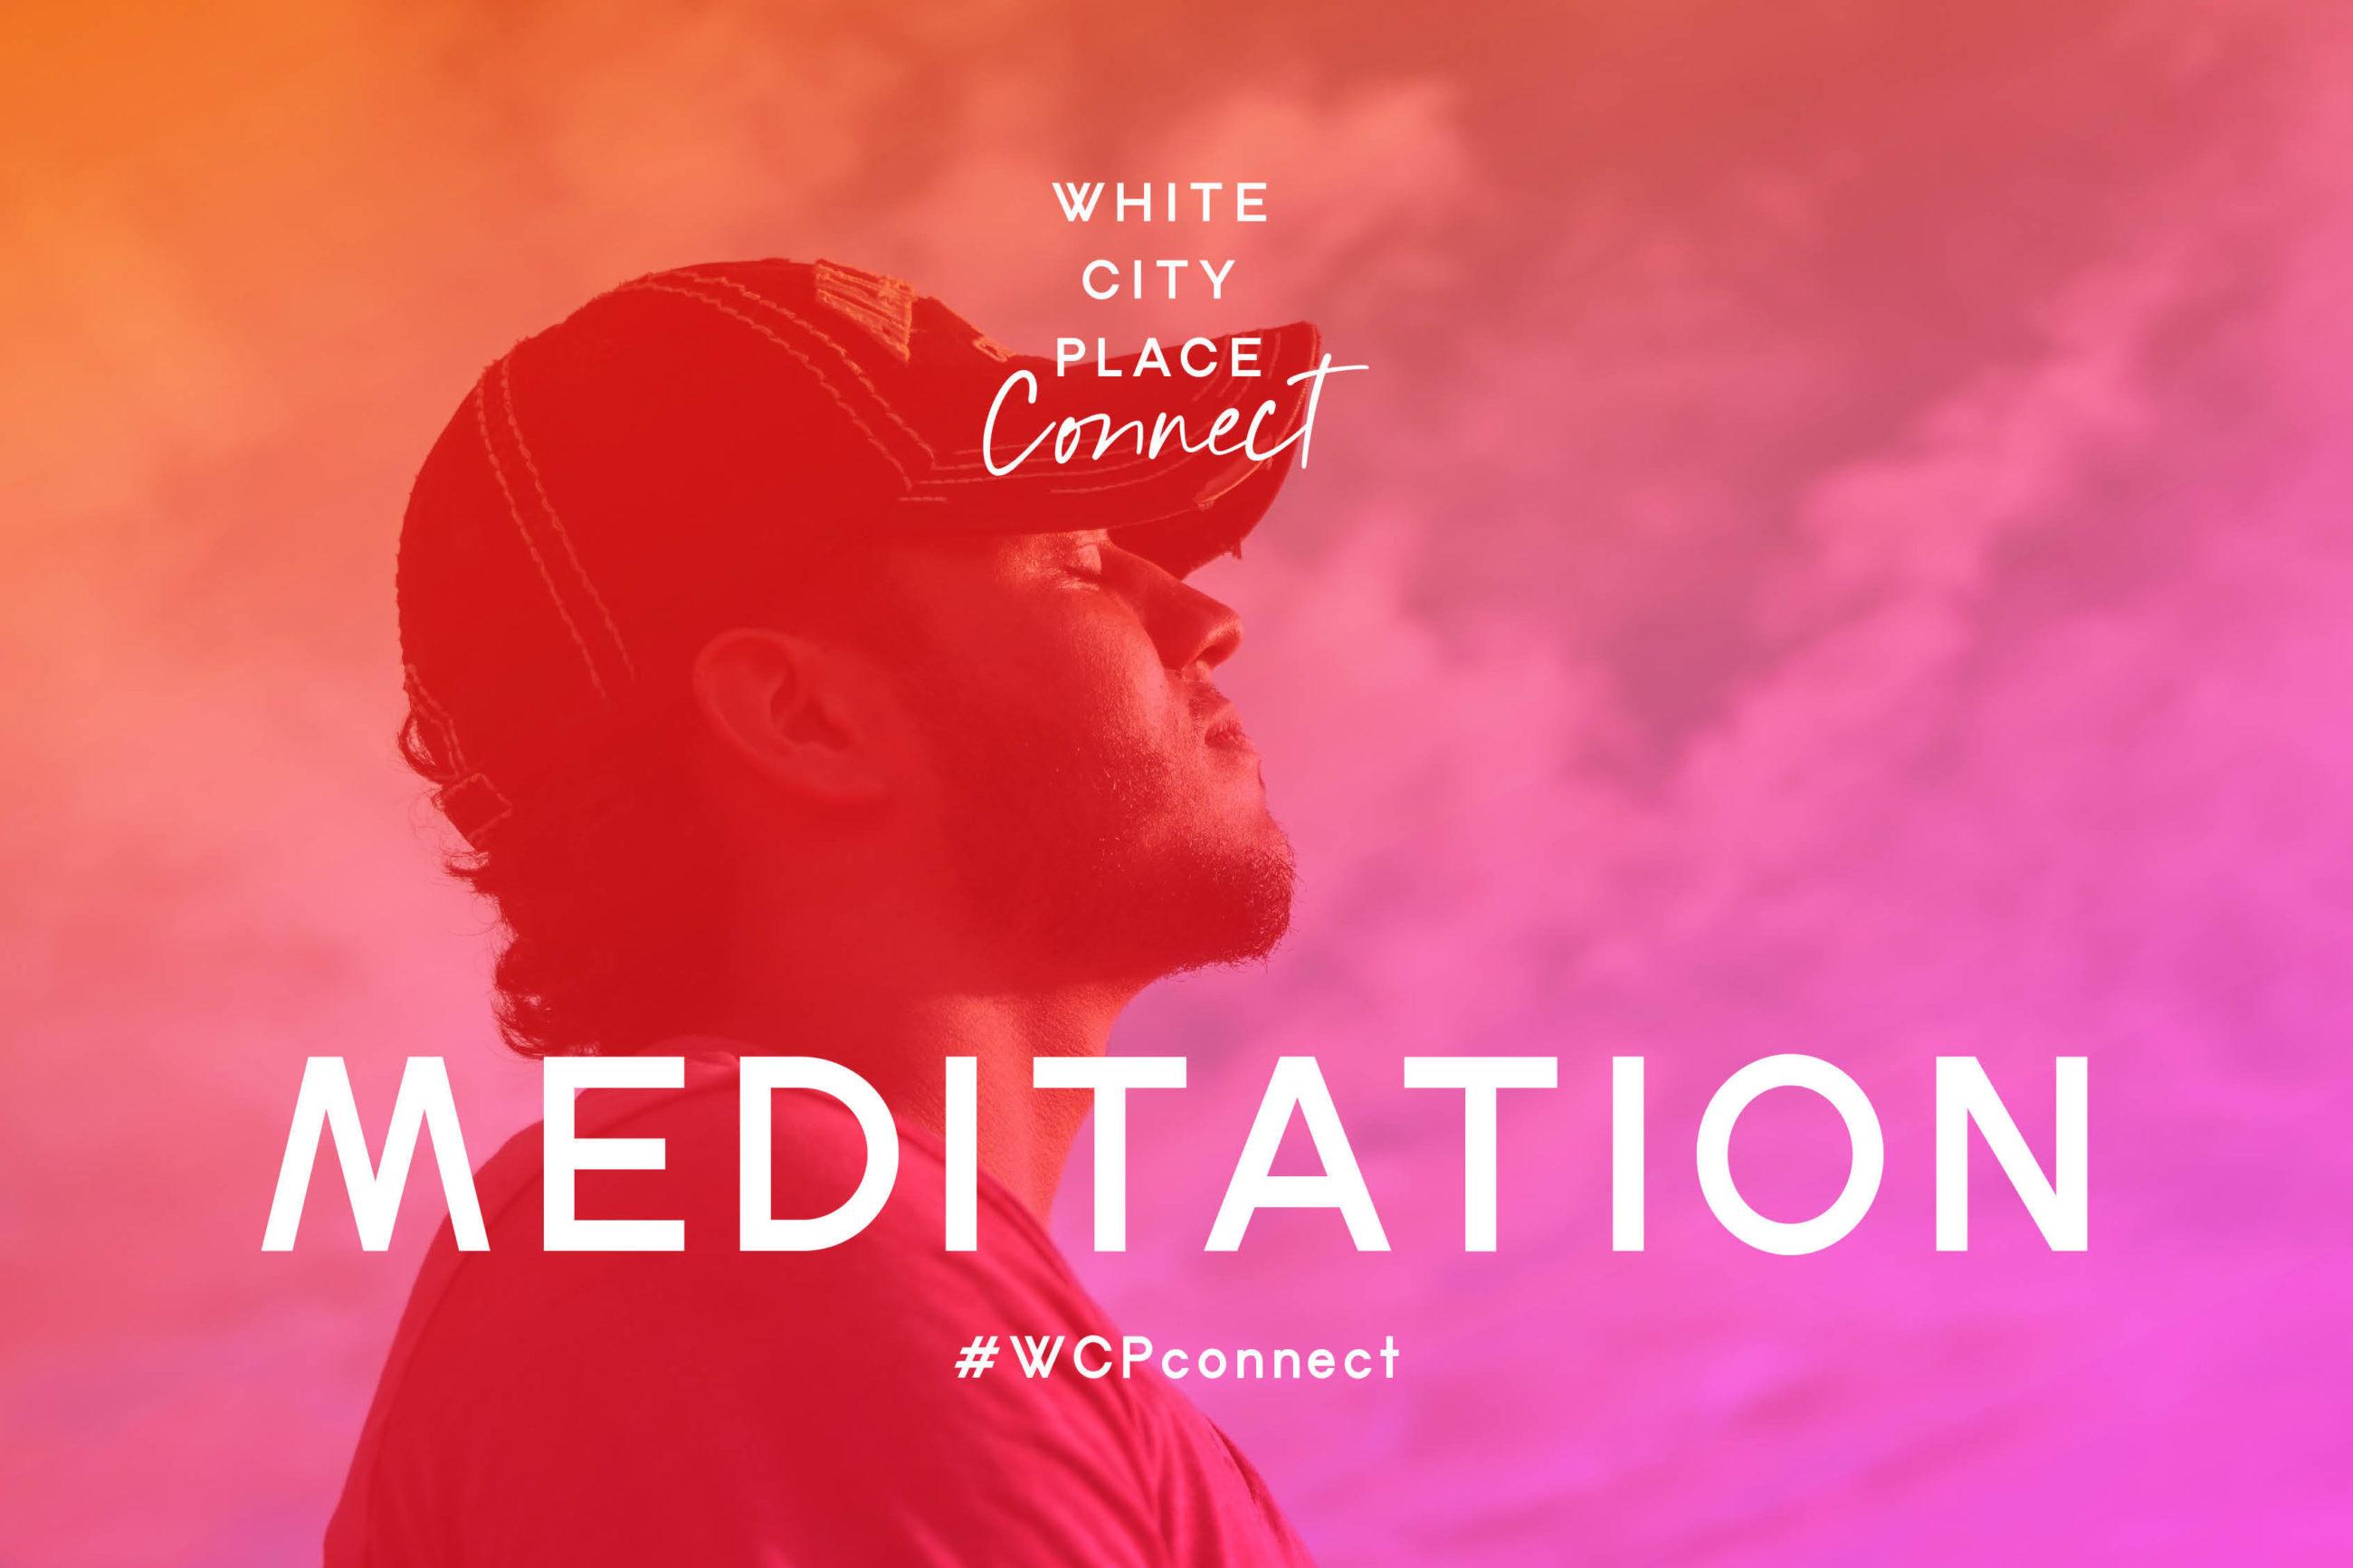 White City Place Connect: Monday Meditation Feature Image